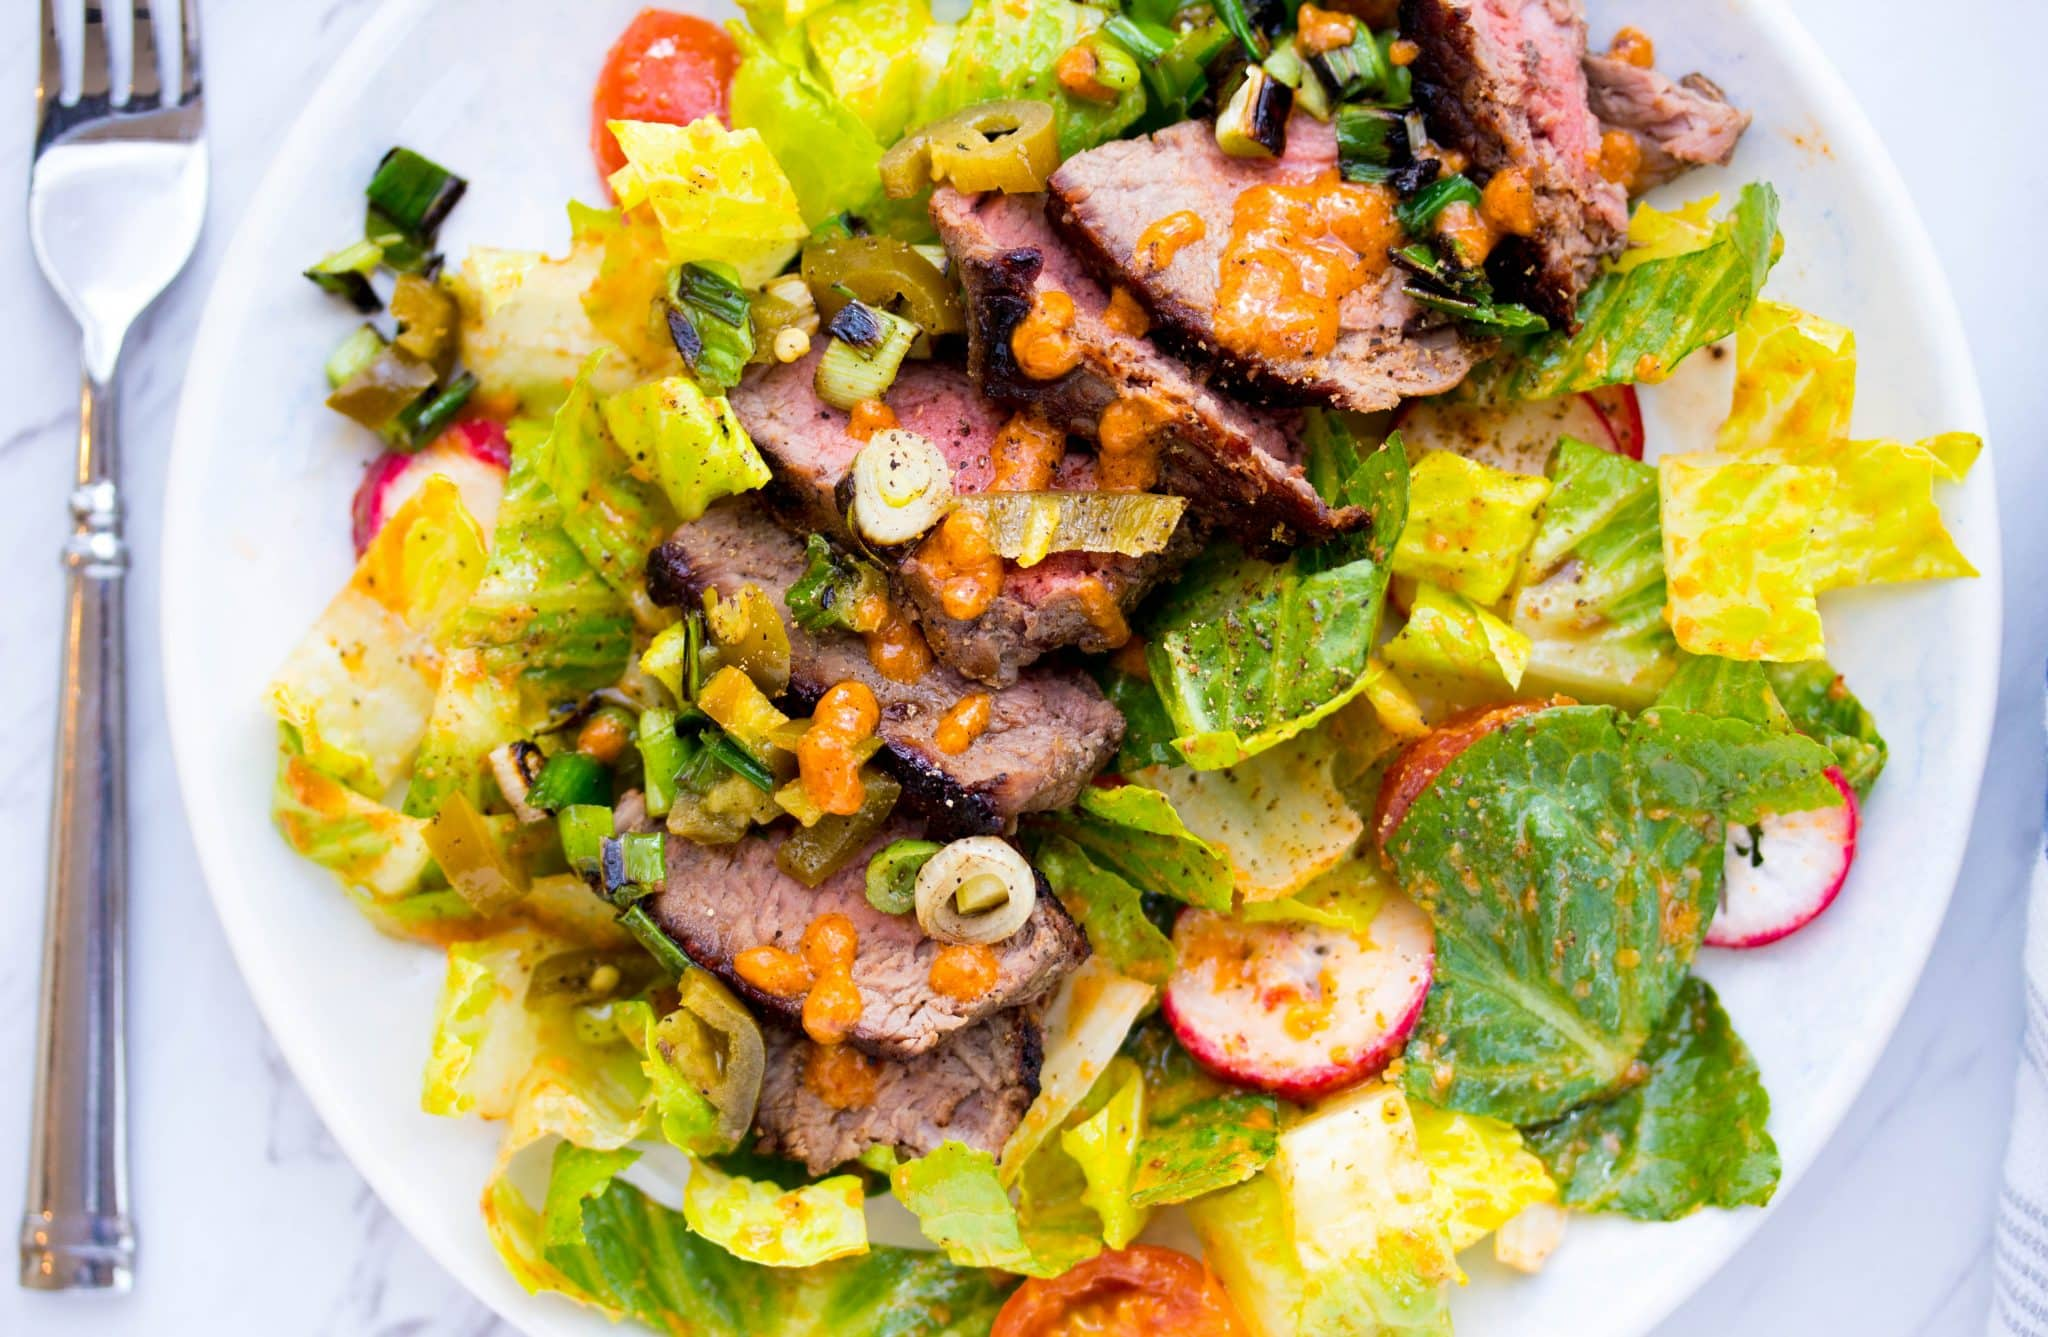 Sun Basket Review- Steak Salad